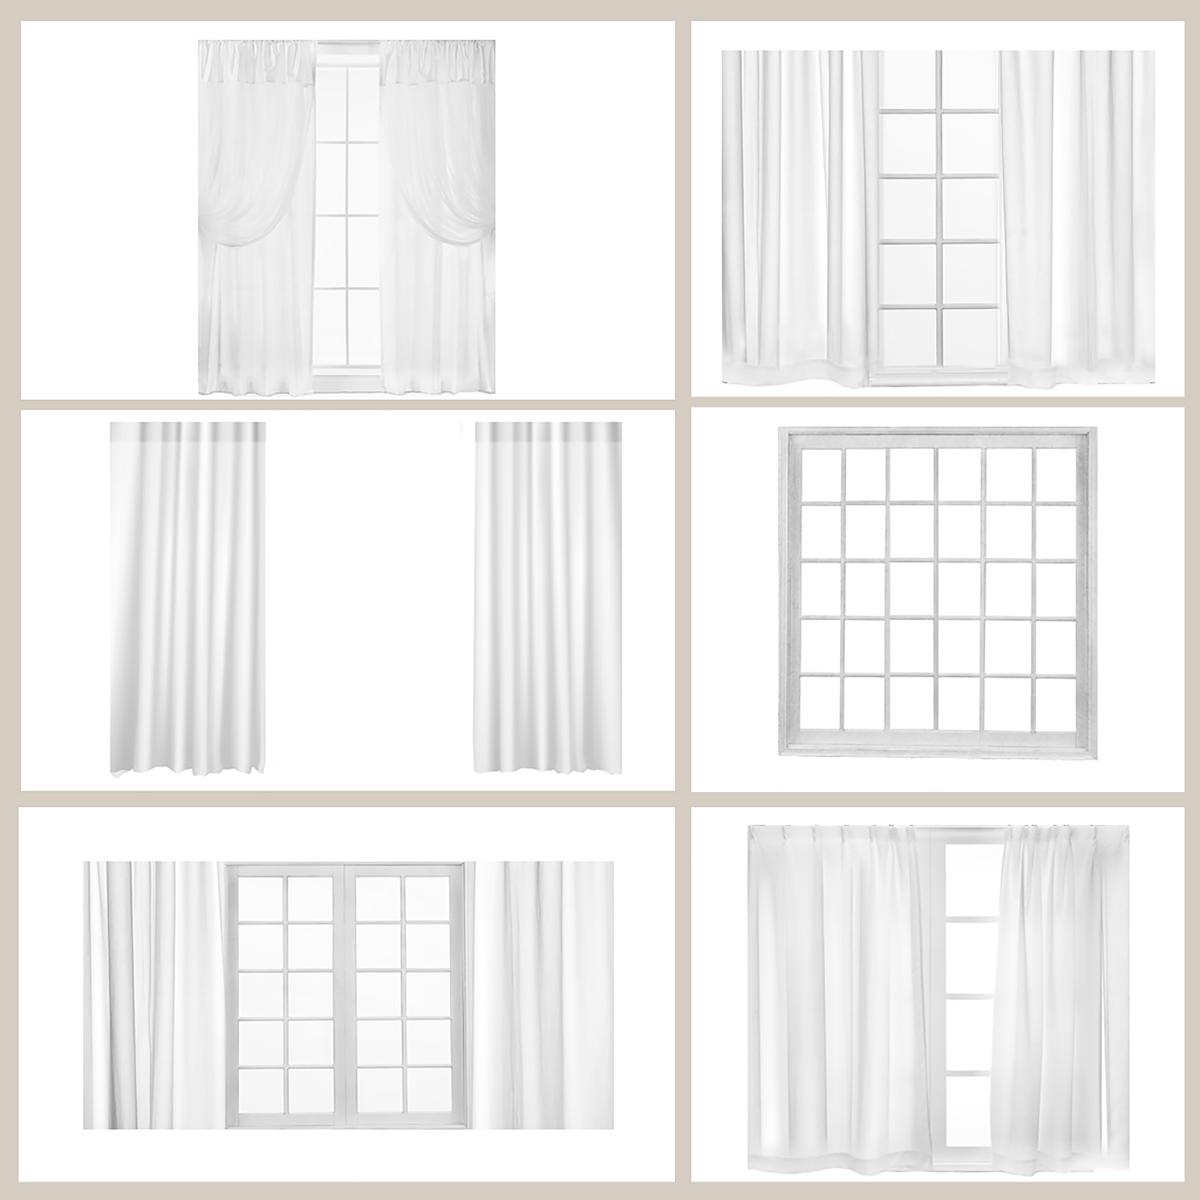 White Curtains & Window Overlays.